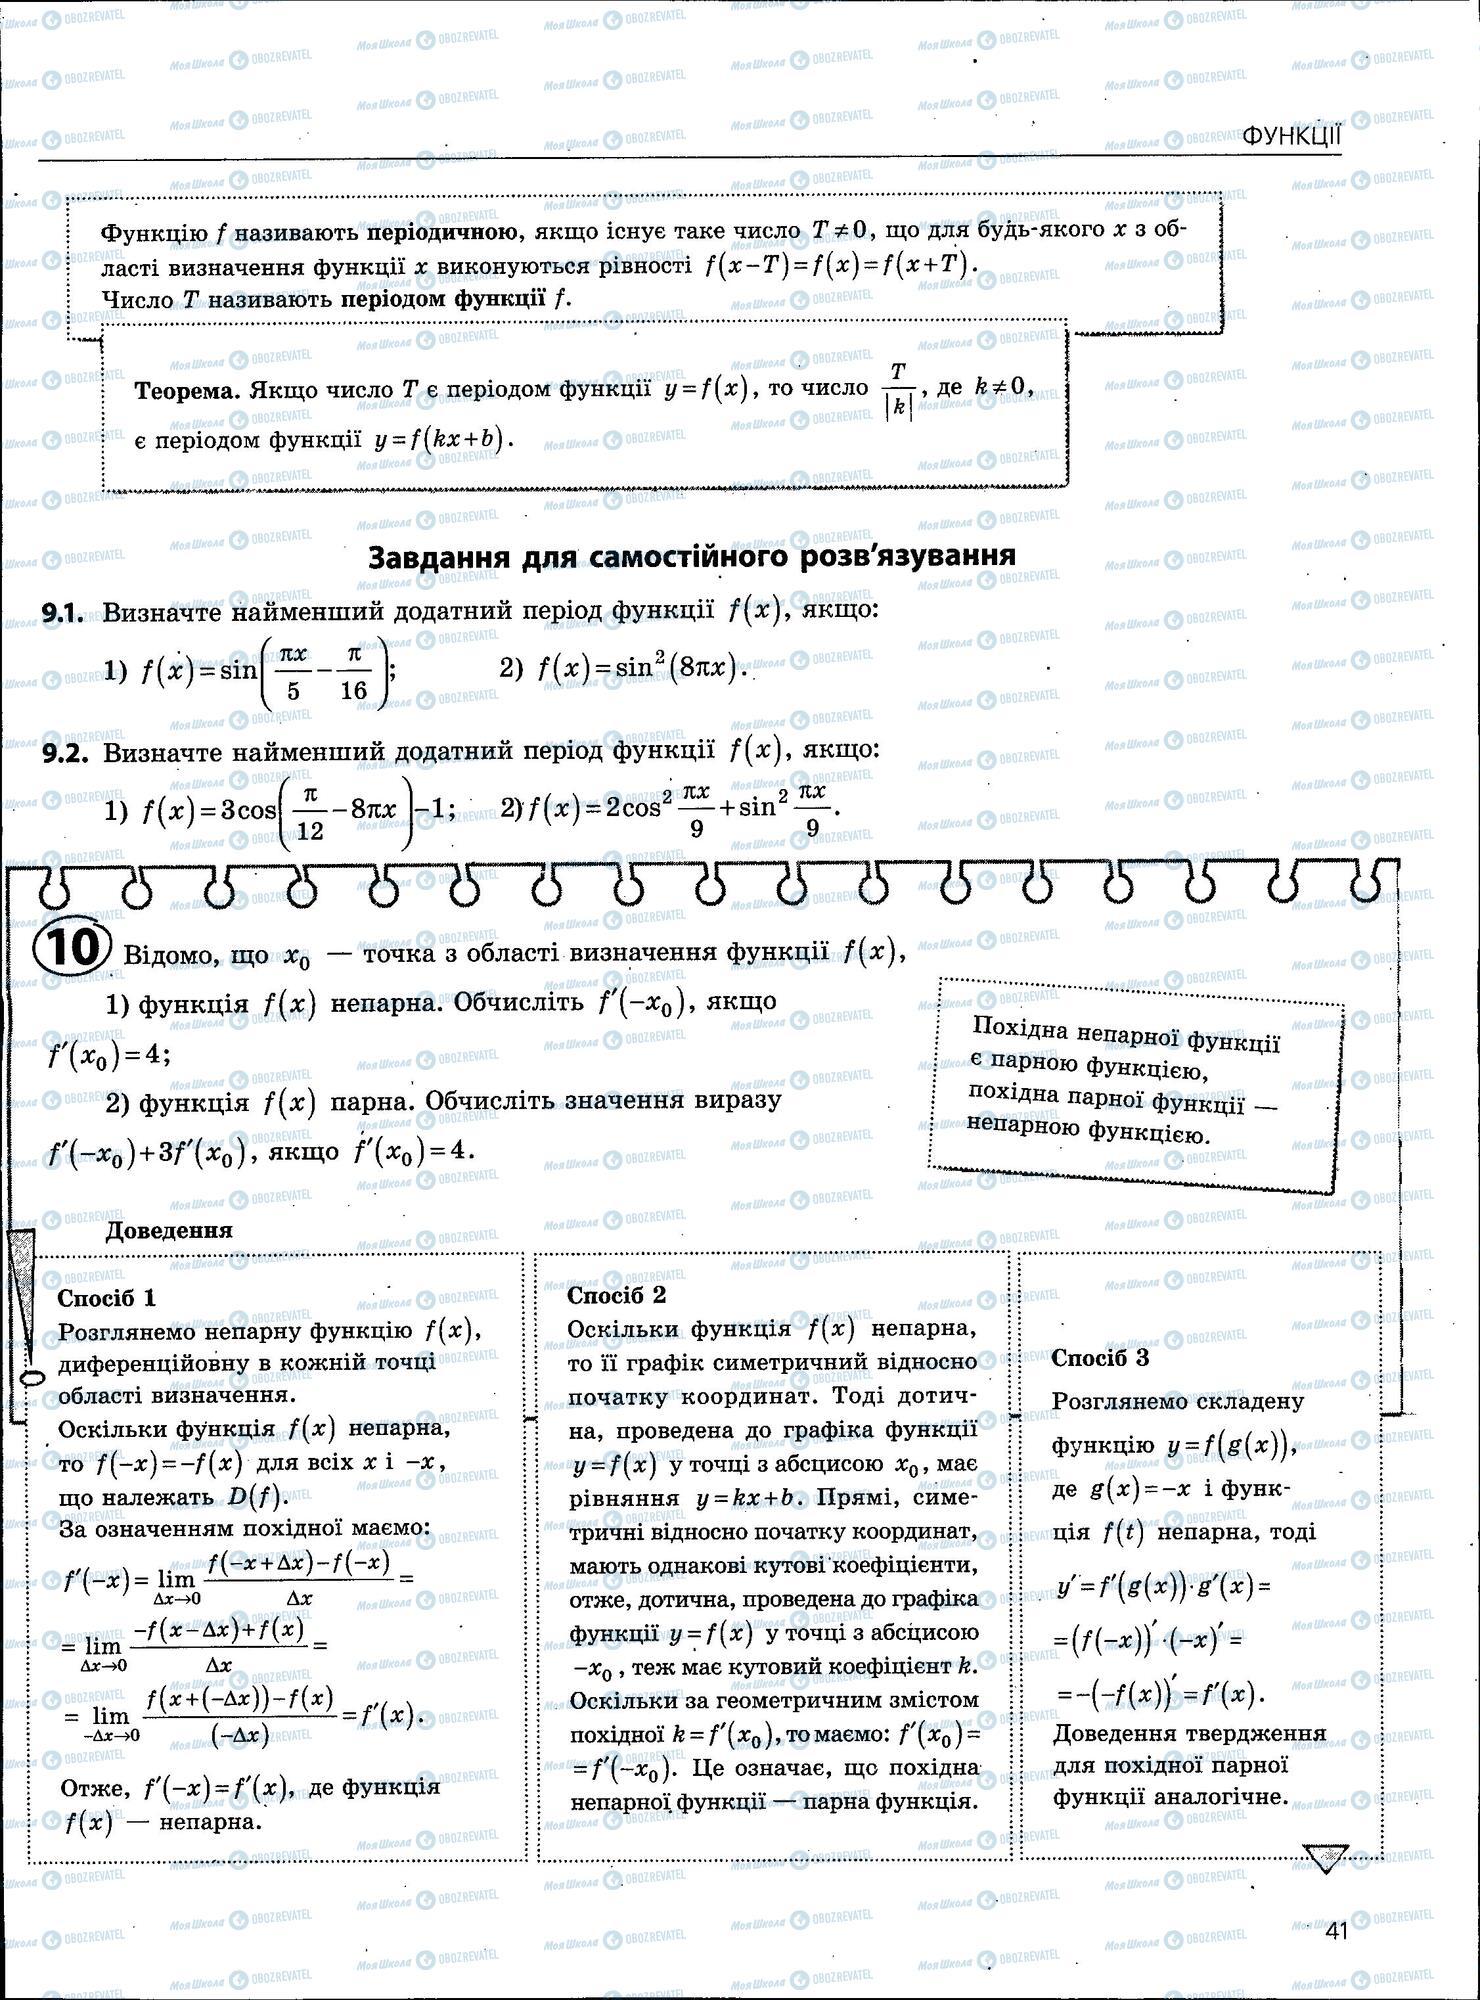 ЗНО Математика 11 класс страница 41